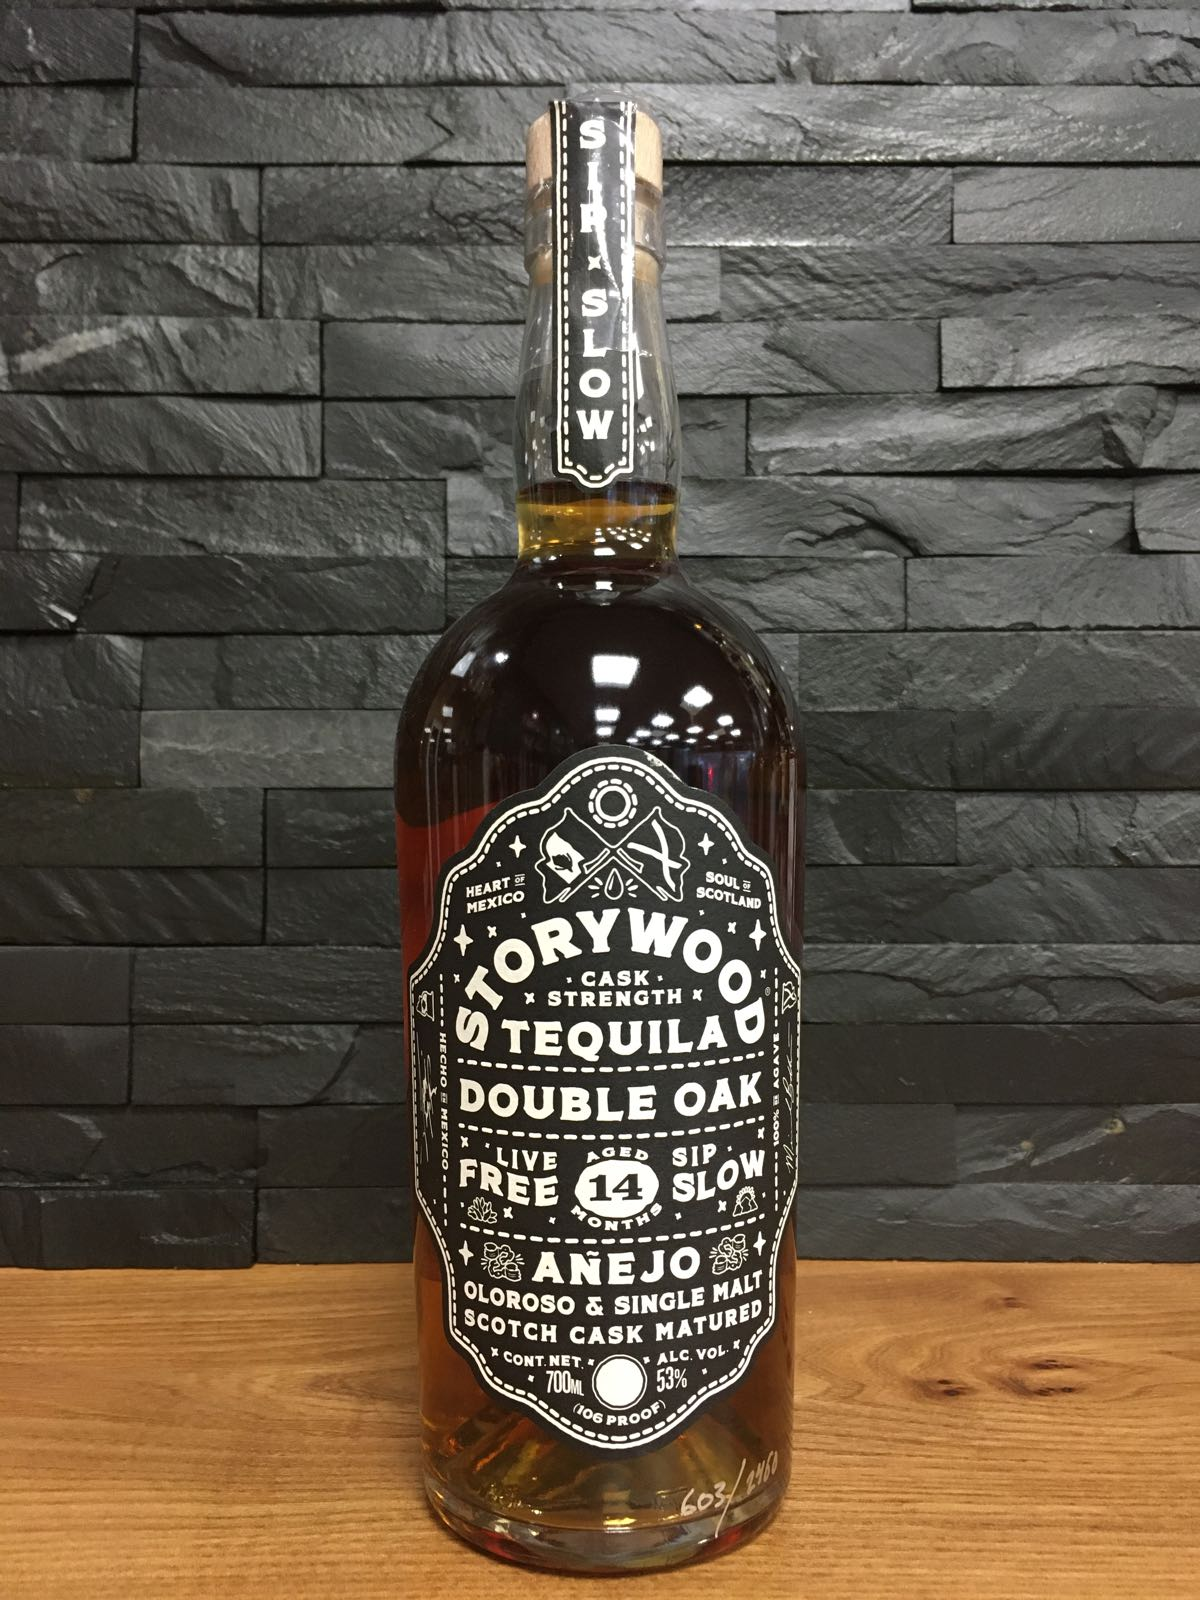 Storywood Tequila Double Oak Cask Strength 70cl